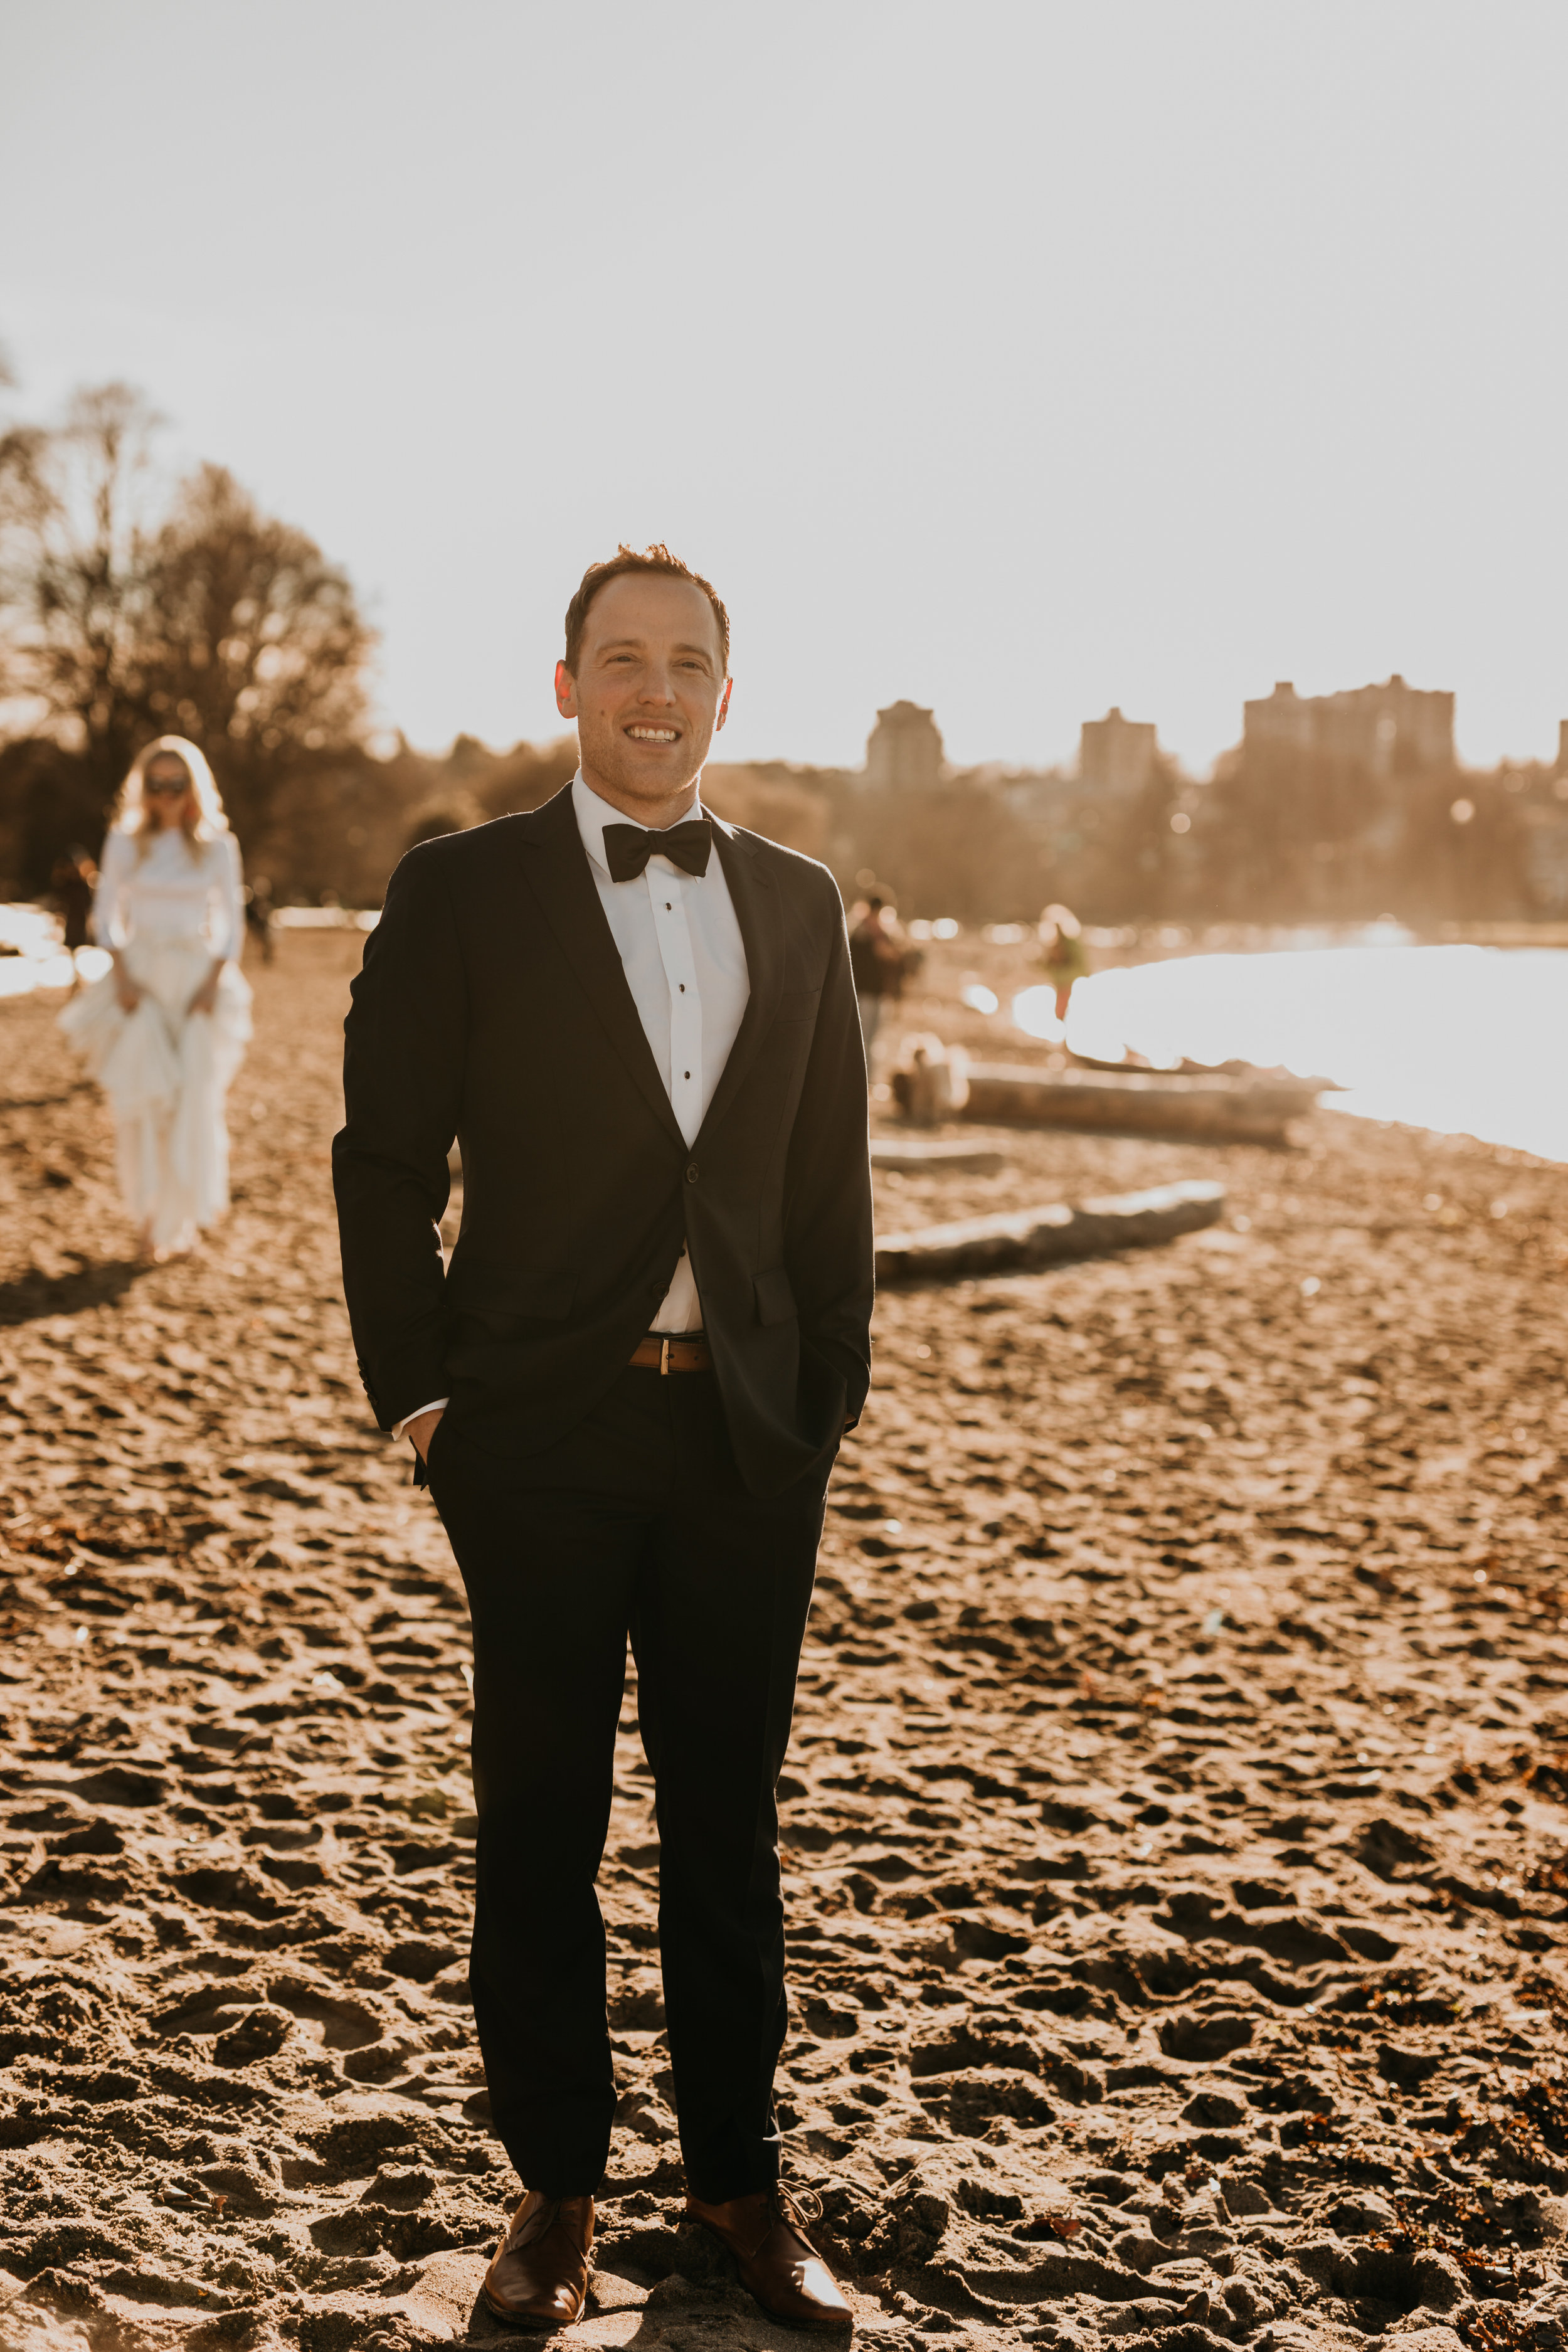 Vancouver Wedding Photos - Vegan Wedding Photographer - New Years Eve Wedding Photos - Vancouver Wedding Photographer - Vancouver Wedding Videographer - 592.JPG